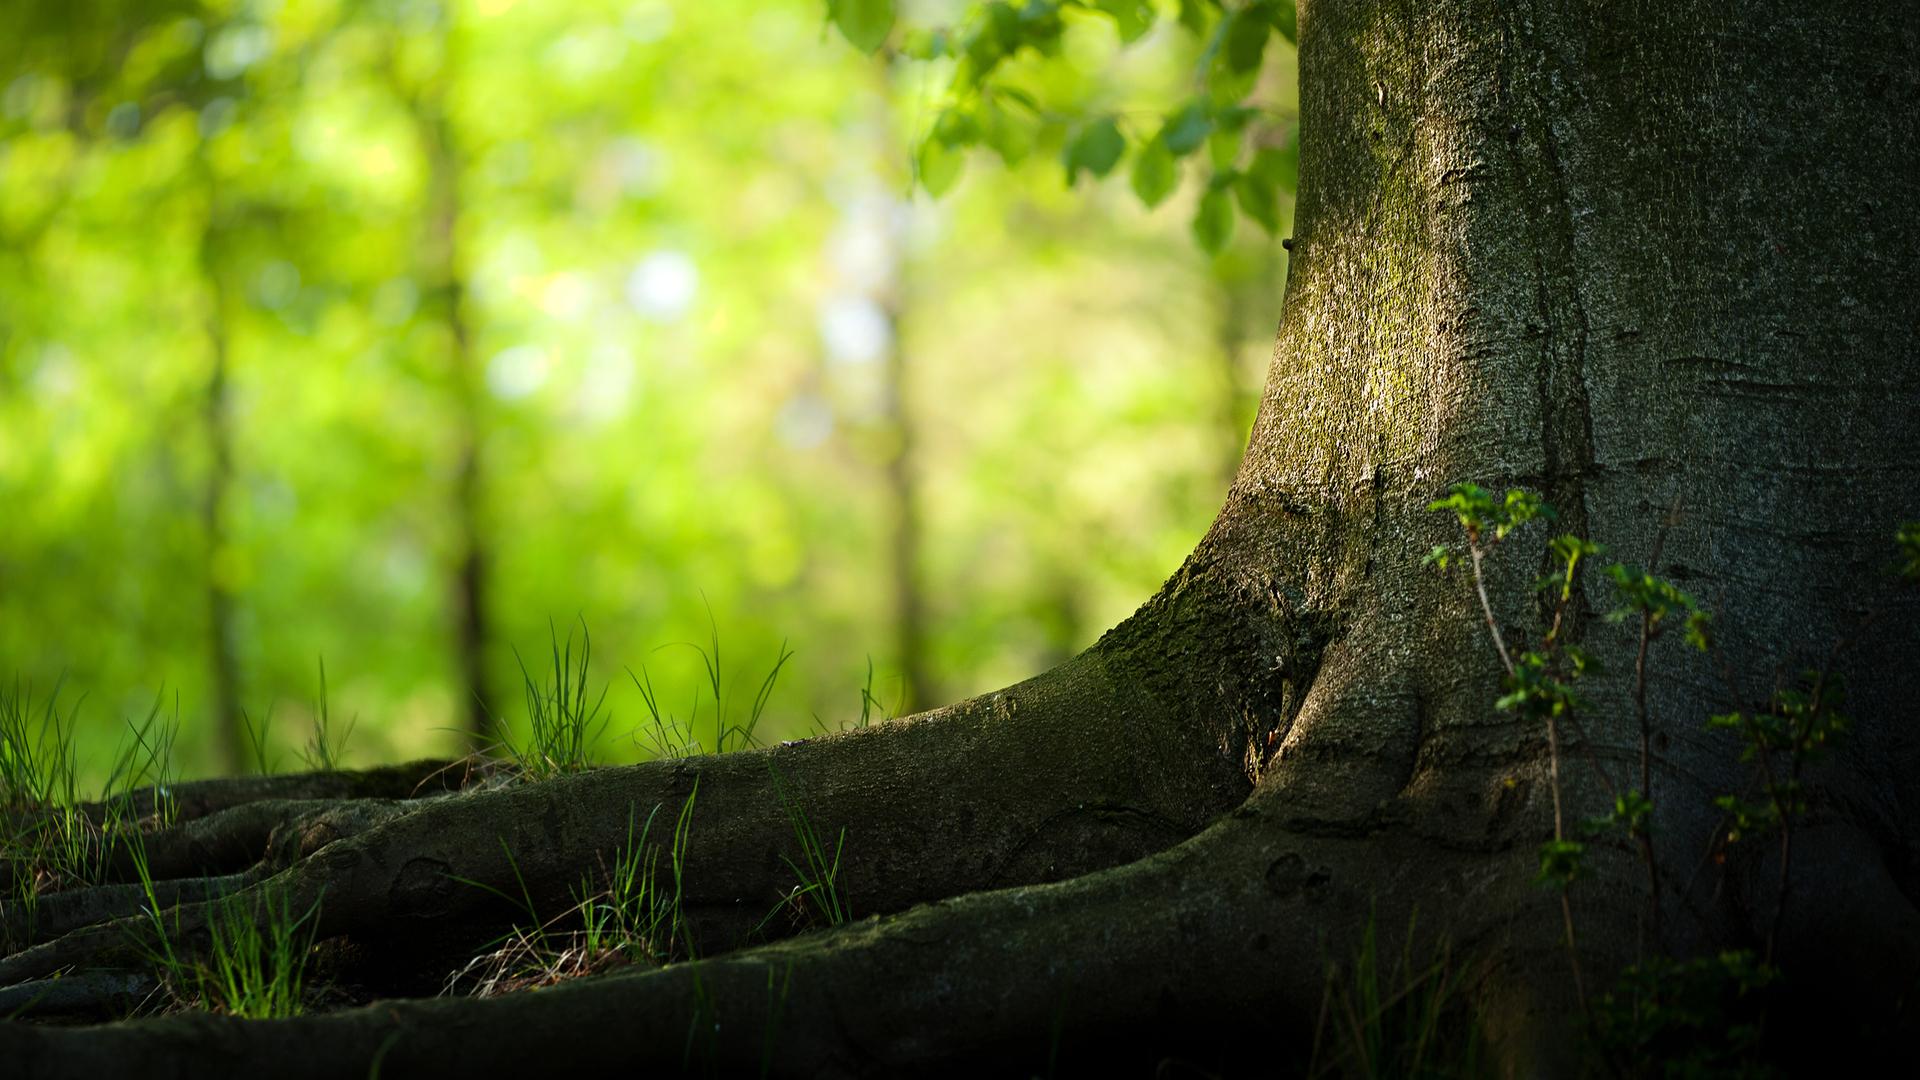 Hd wallpaper tree - Tree Hd Desktop Backgrounds Natural Beautiful Trees Hd Wallpaper